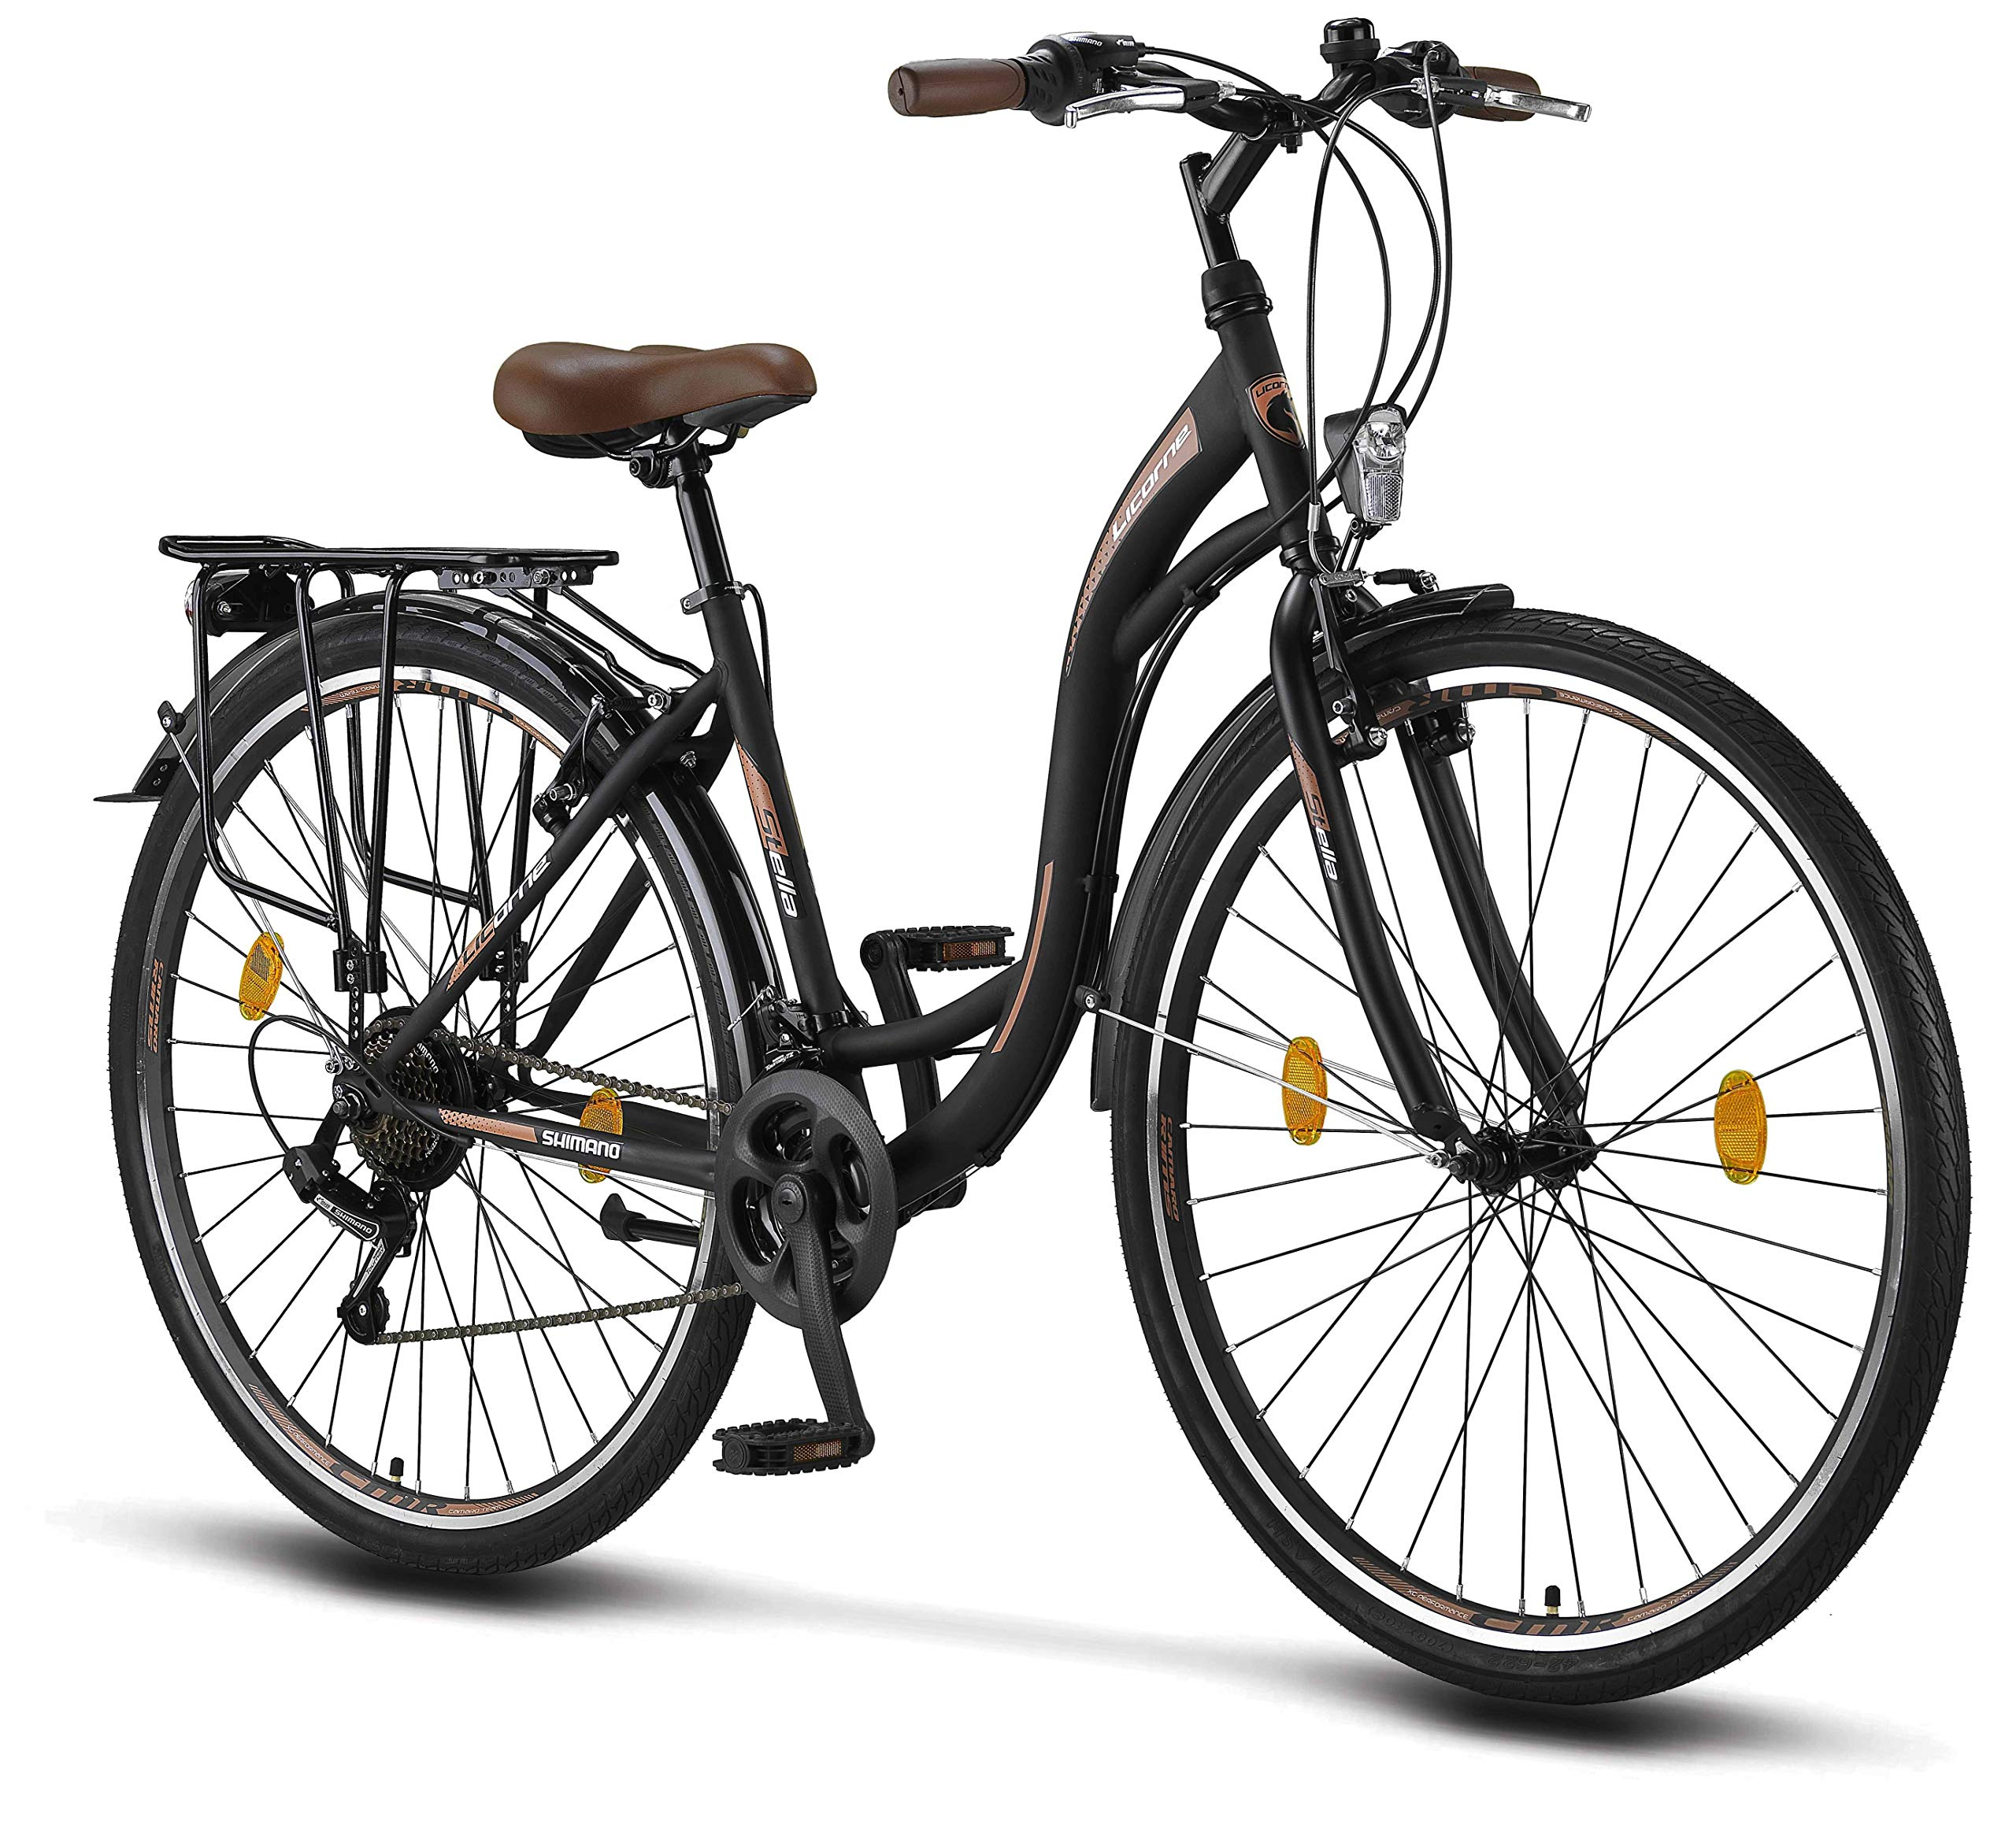 Stella 28 inch women's bike, from 160 cm, bike light, Shimano 21 speed gear, ladies city bike, women's bike, Comfort, Bikes, Retro, Holland, CTB Woman Lady Girl Vintage